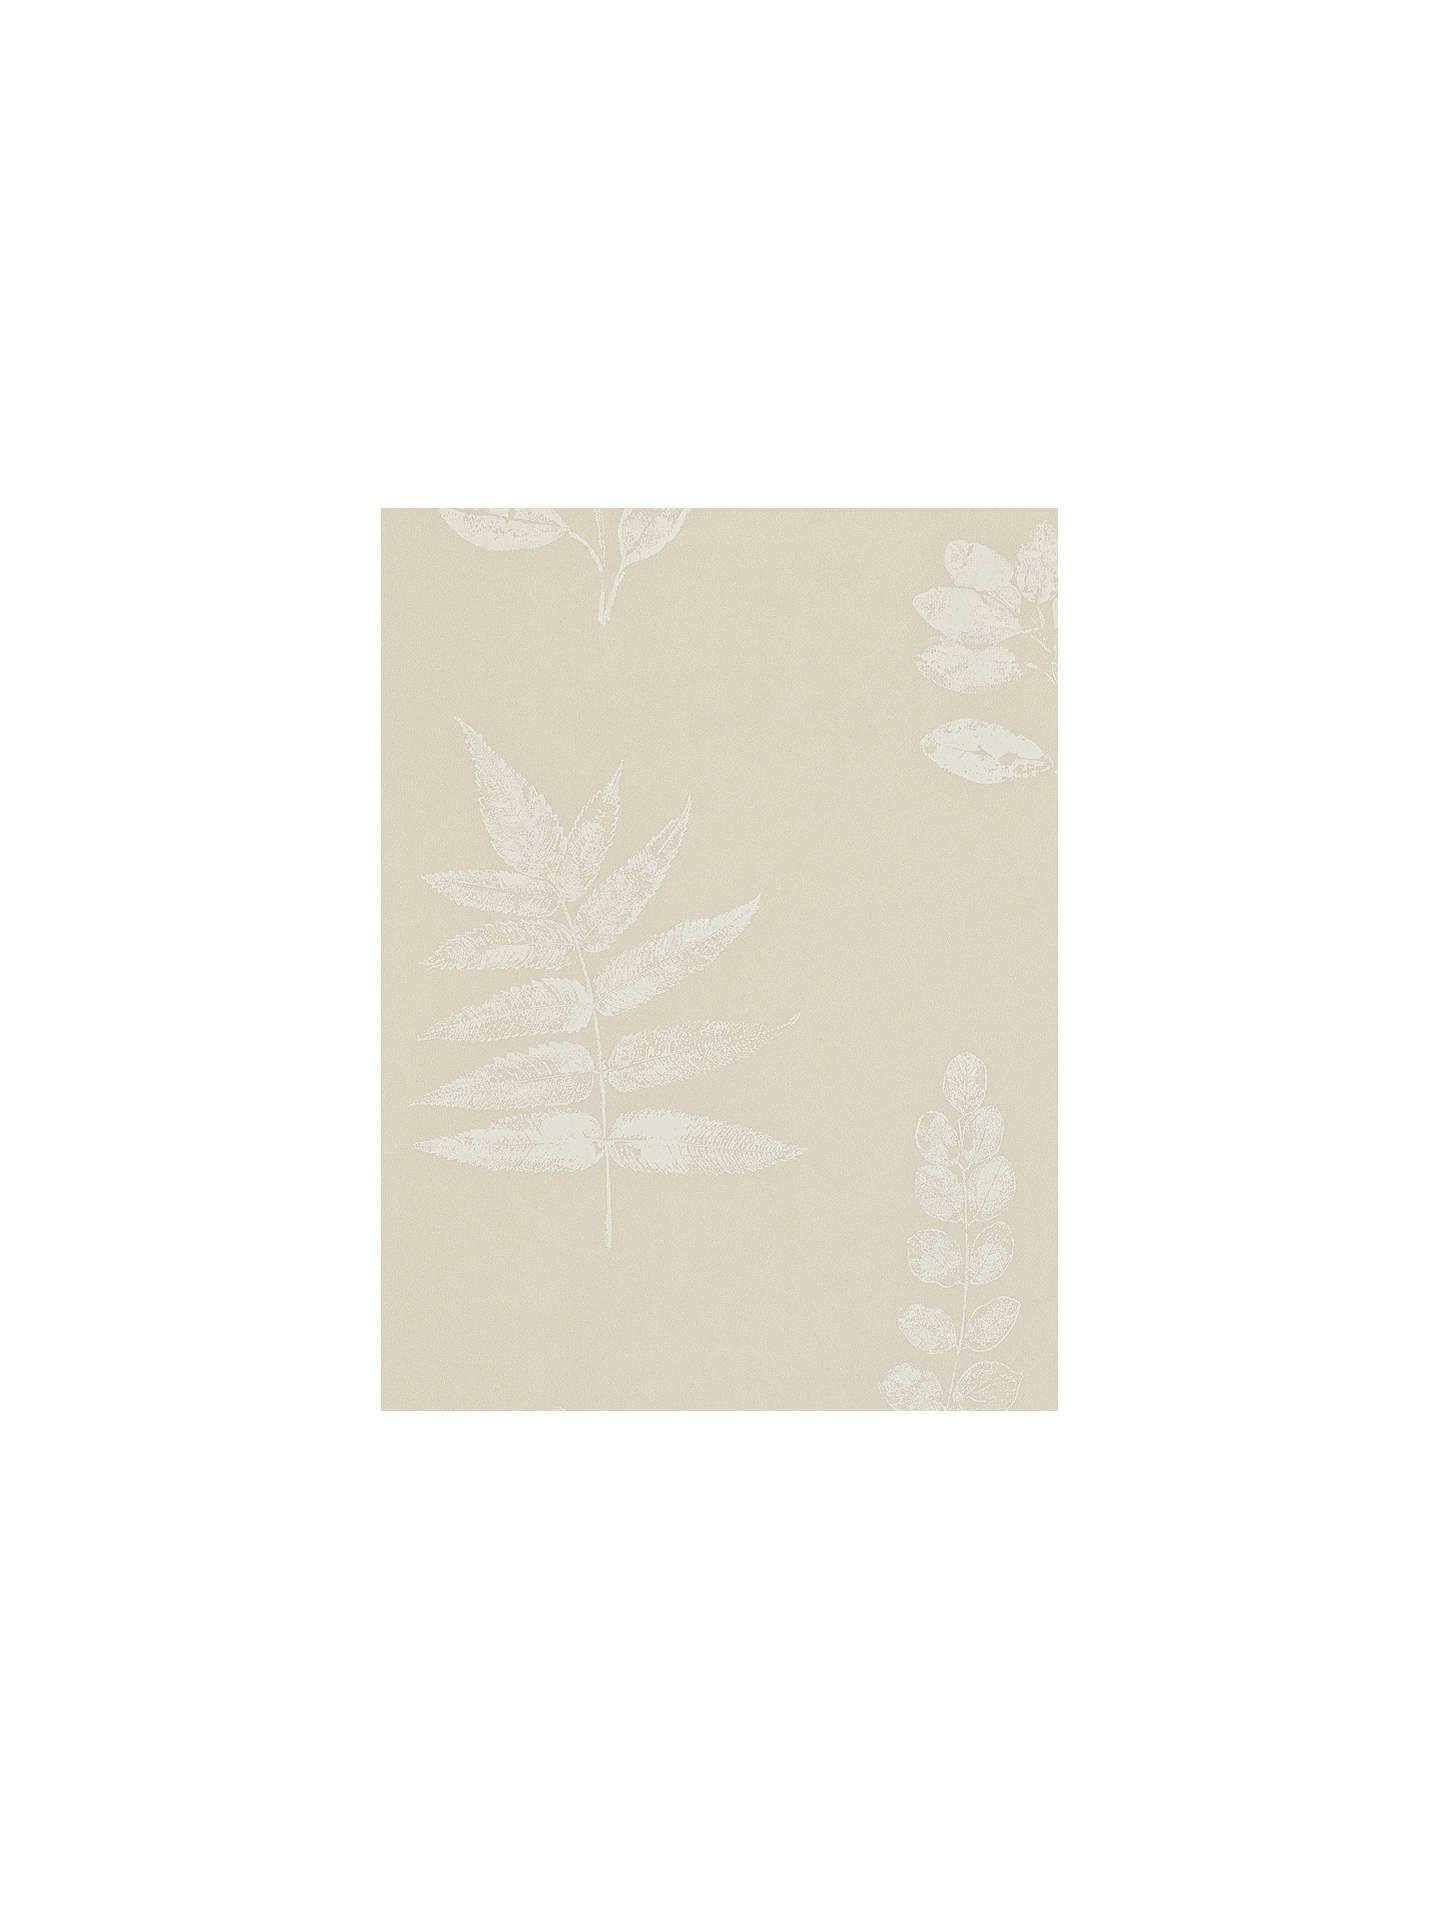 Buy Sanderson Laurel Paste the Wall Wallpaper, DMAD212852 Online at johnlewis.com ...